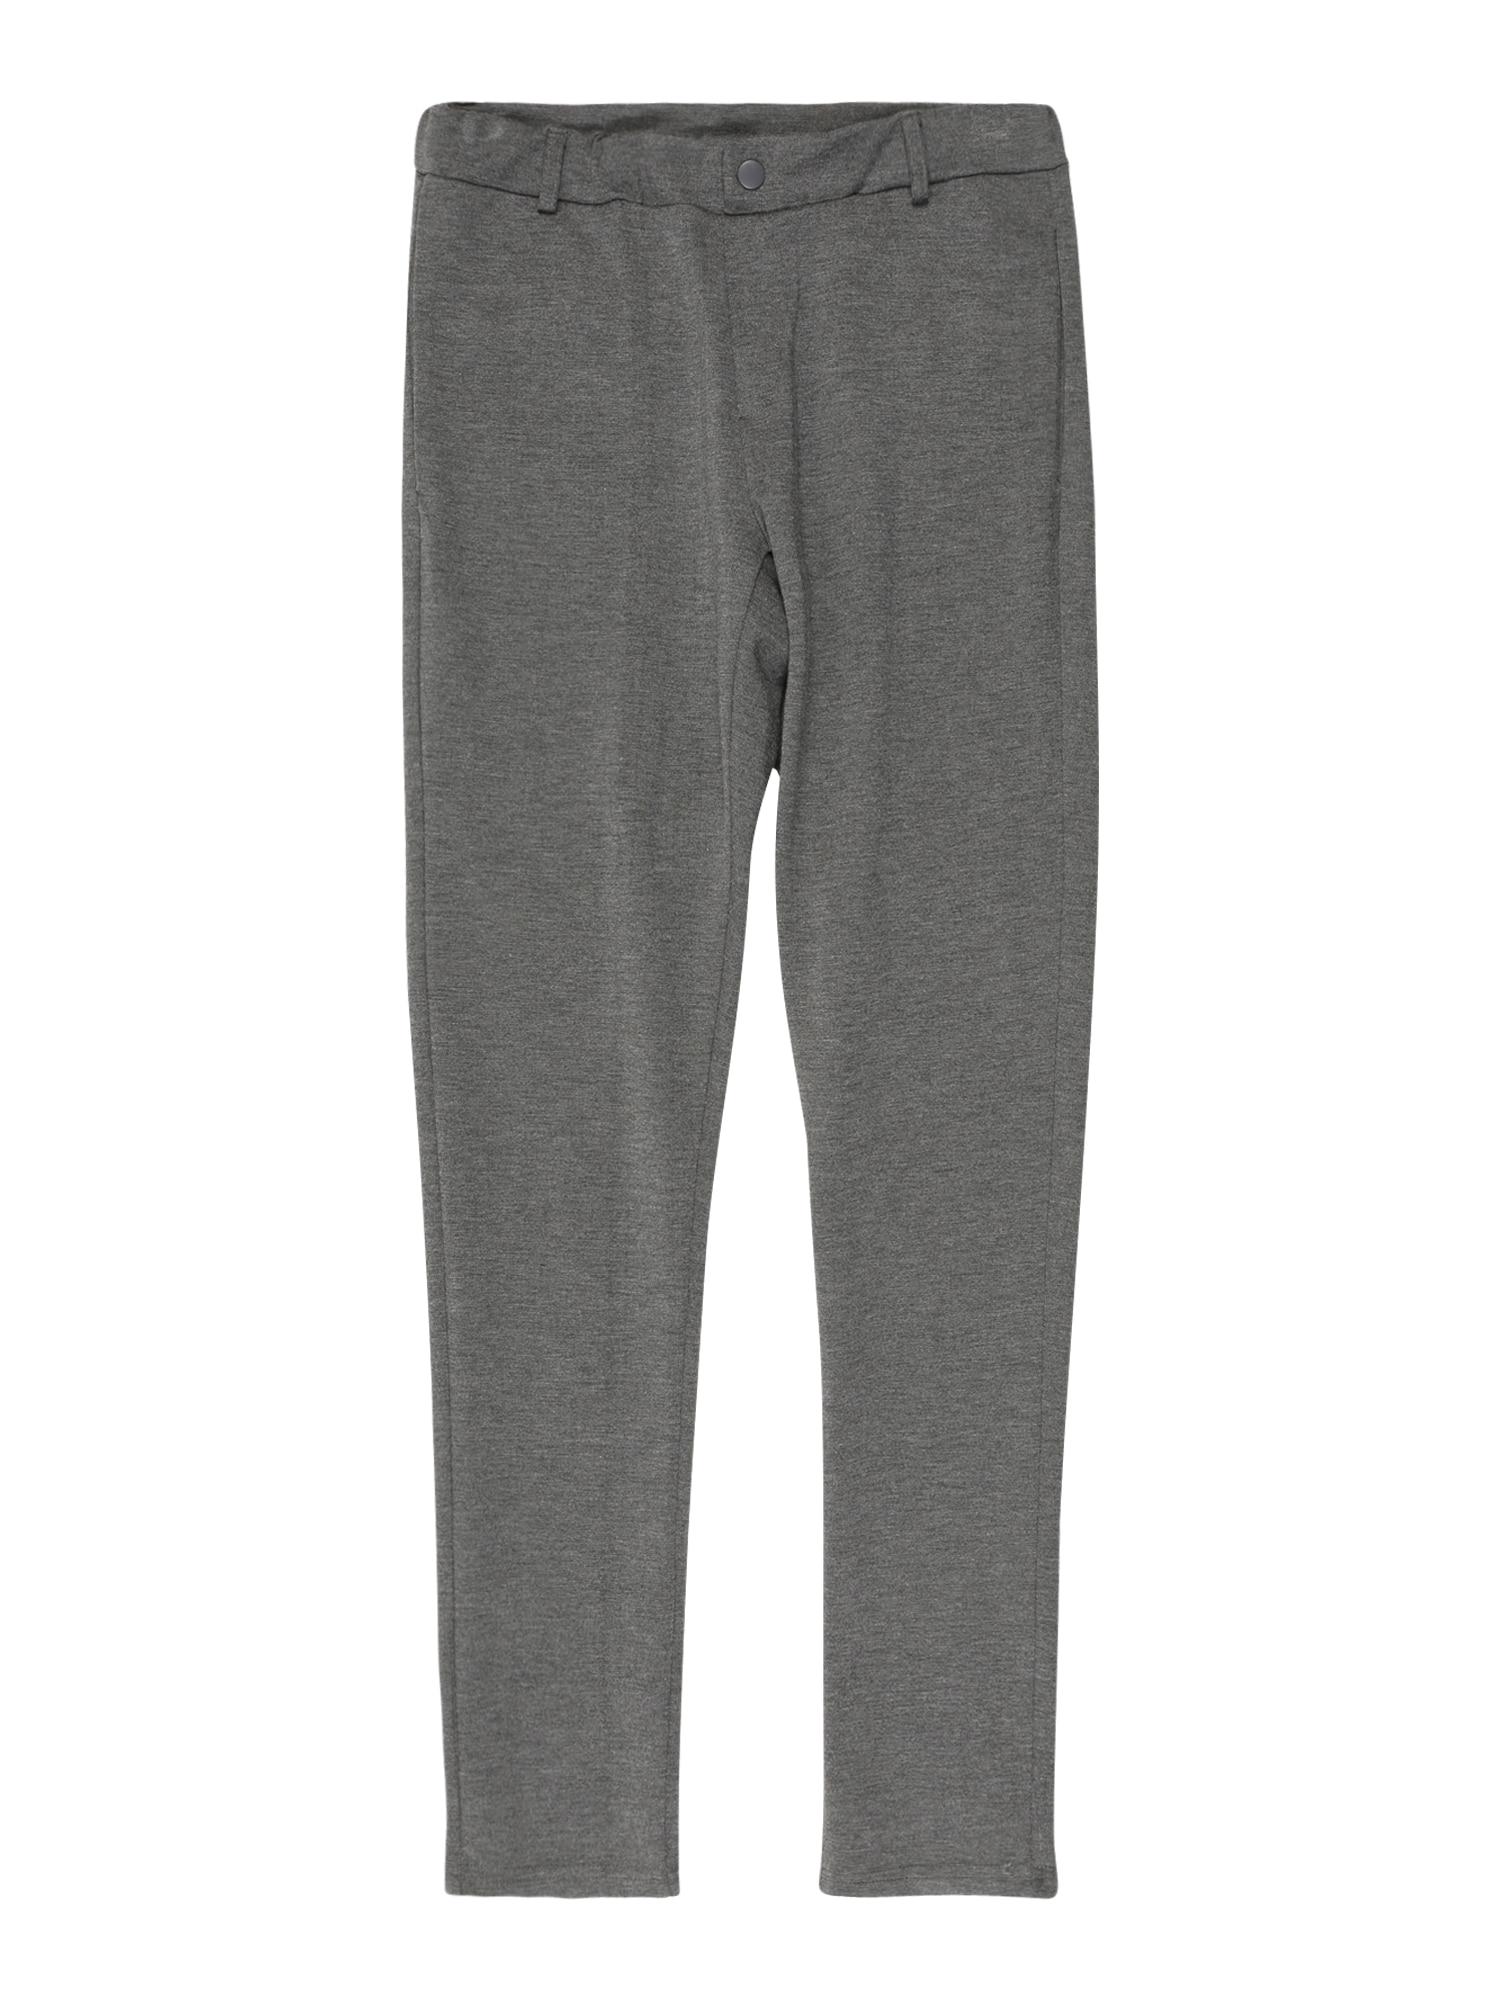 NAME IT Kalhoty 'SINGO'  tmavě šedá